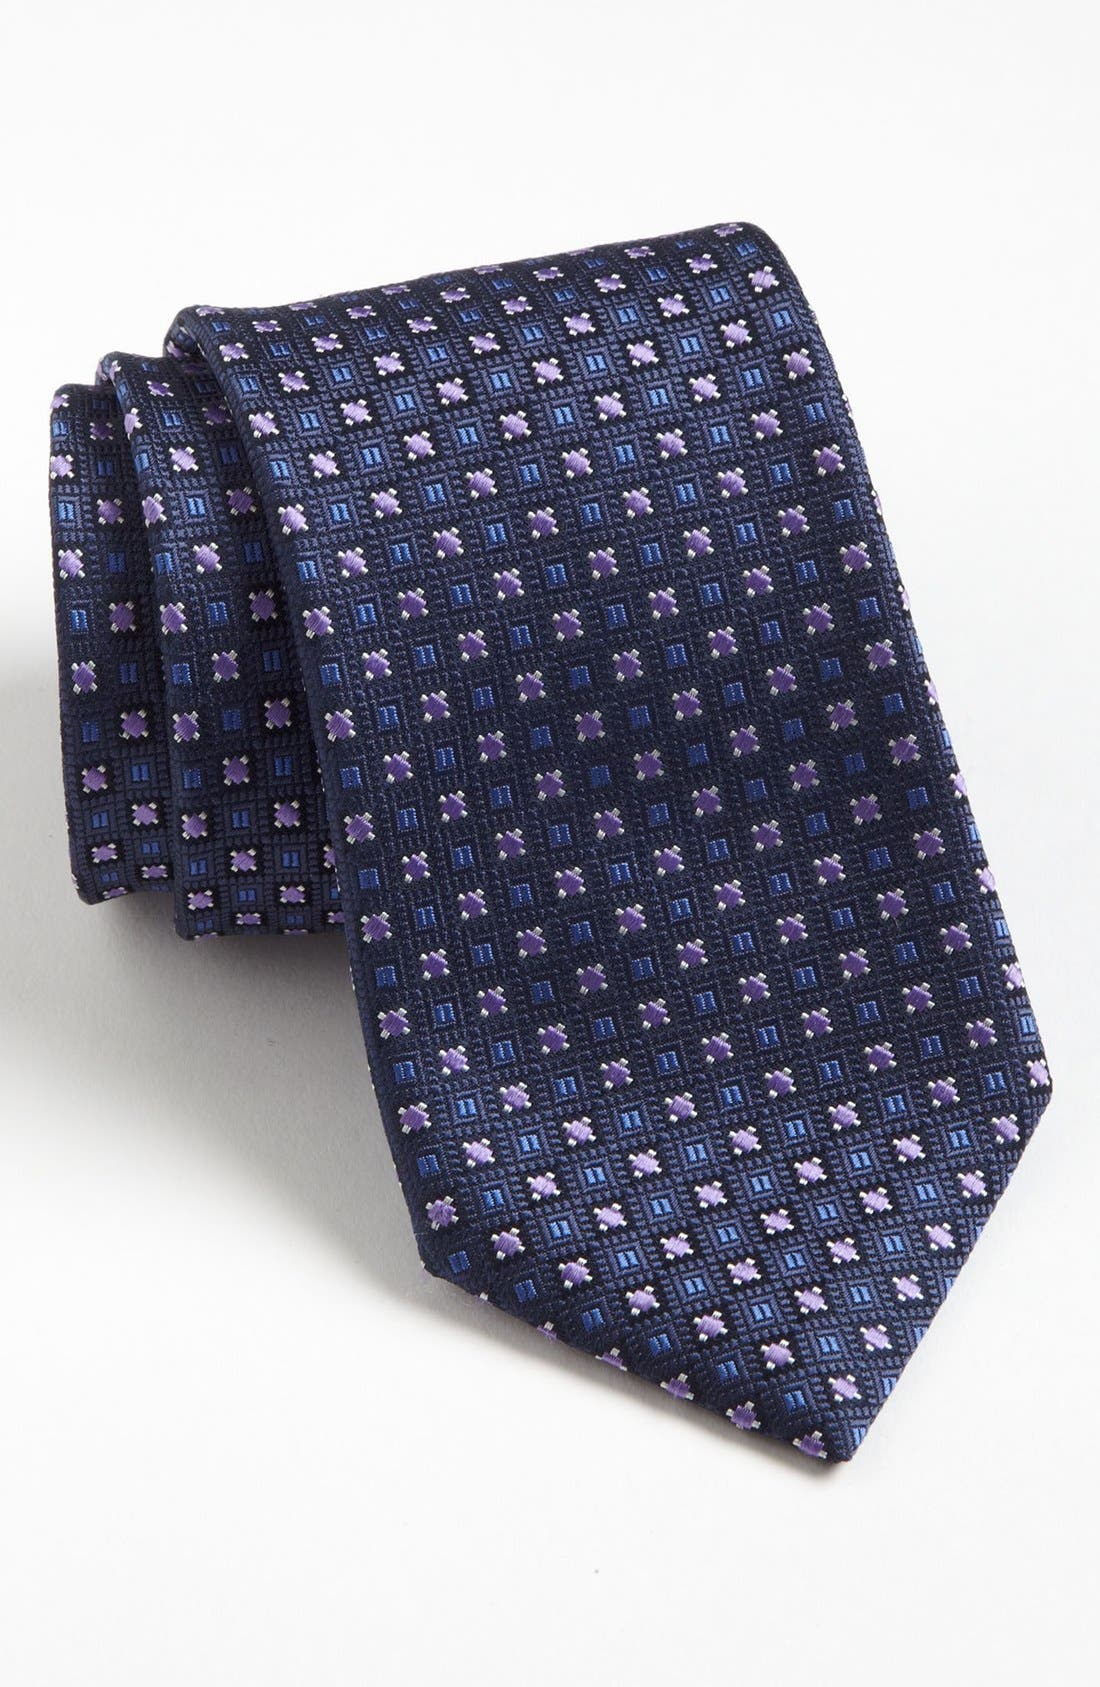 Alternate Image 1 Selected - 1901 Dress Shirt & BOSS Black Tie